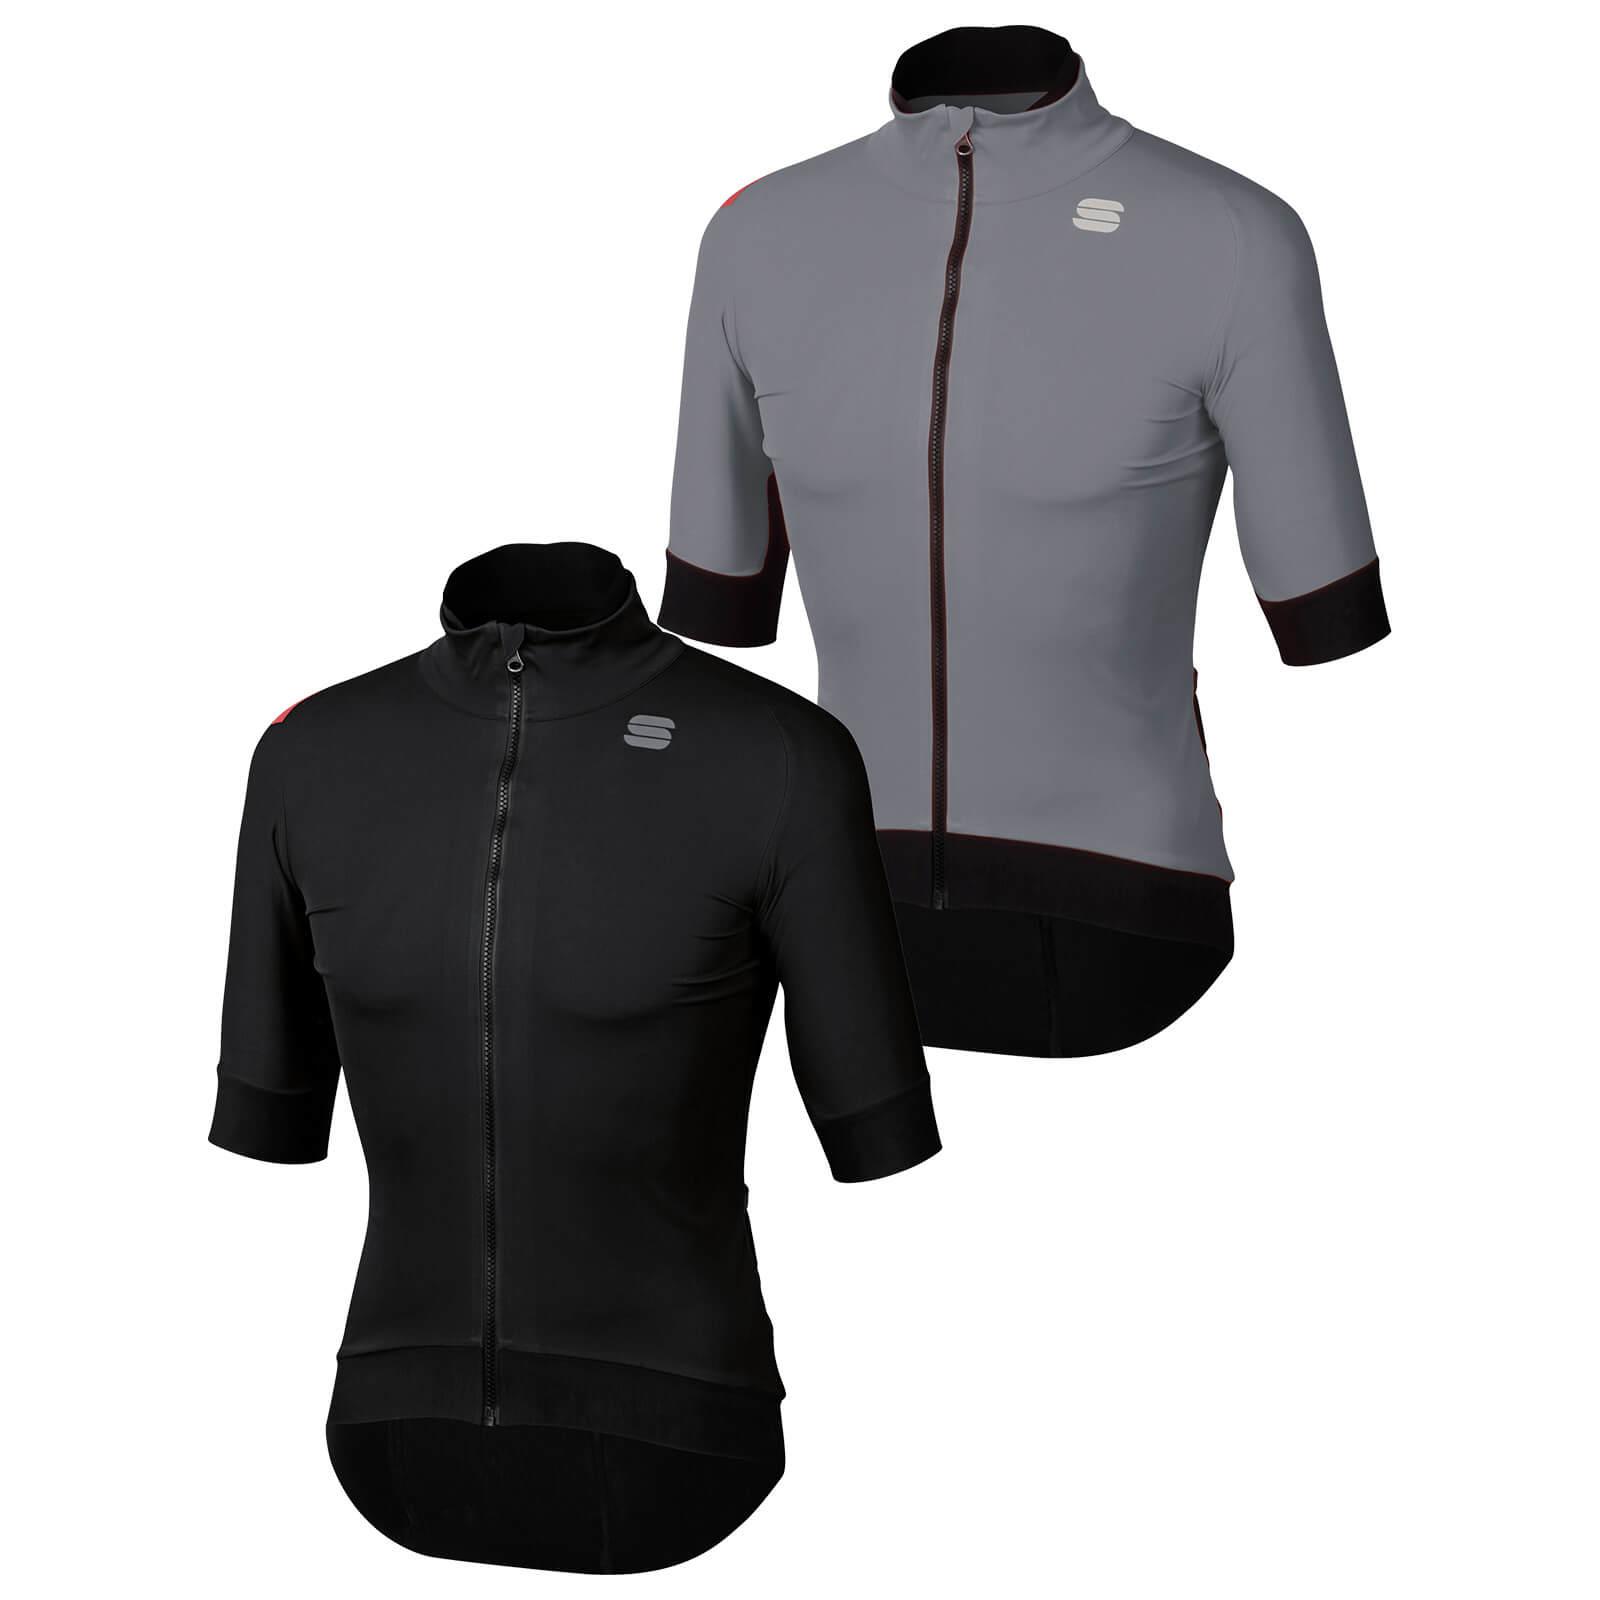 Sportful Fiandre Pro Short Sleeve Jacket - XXL - Black